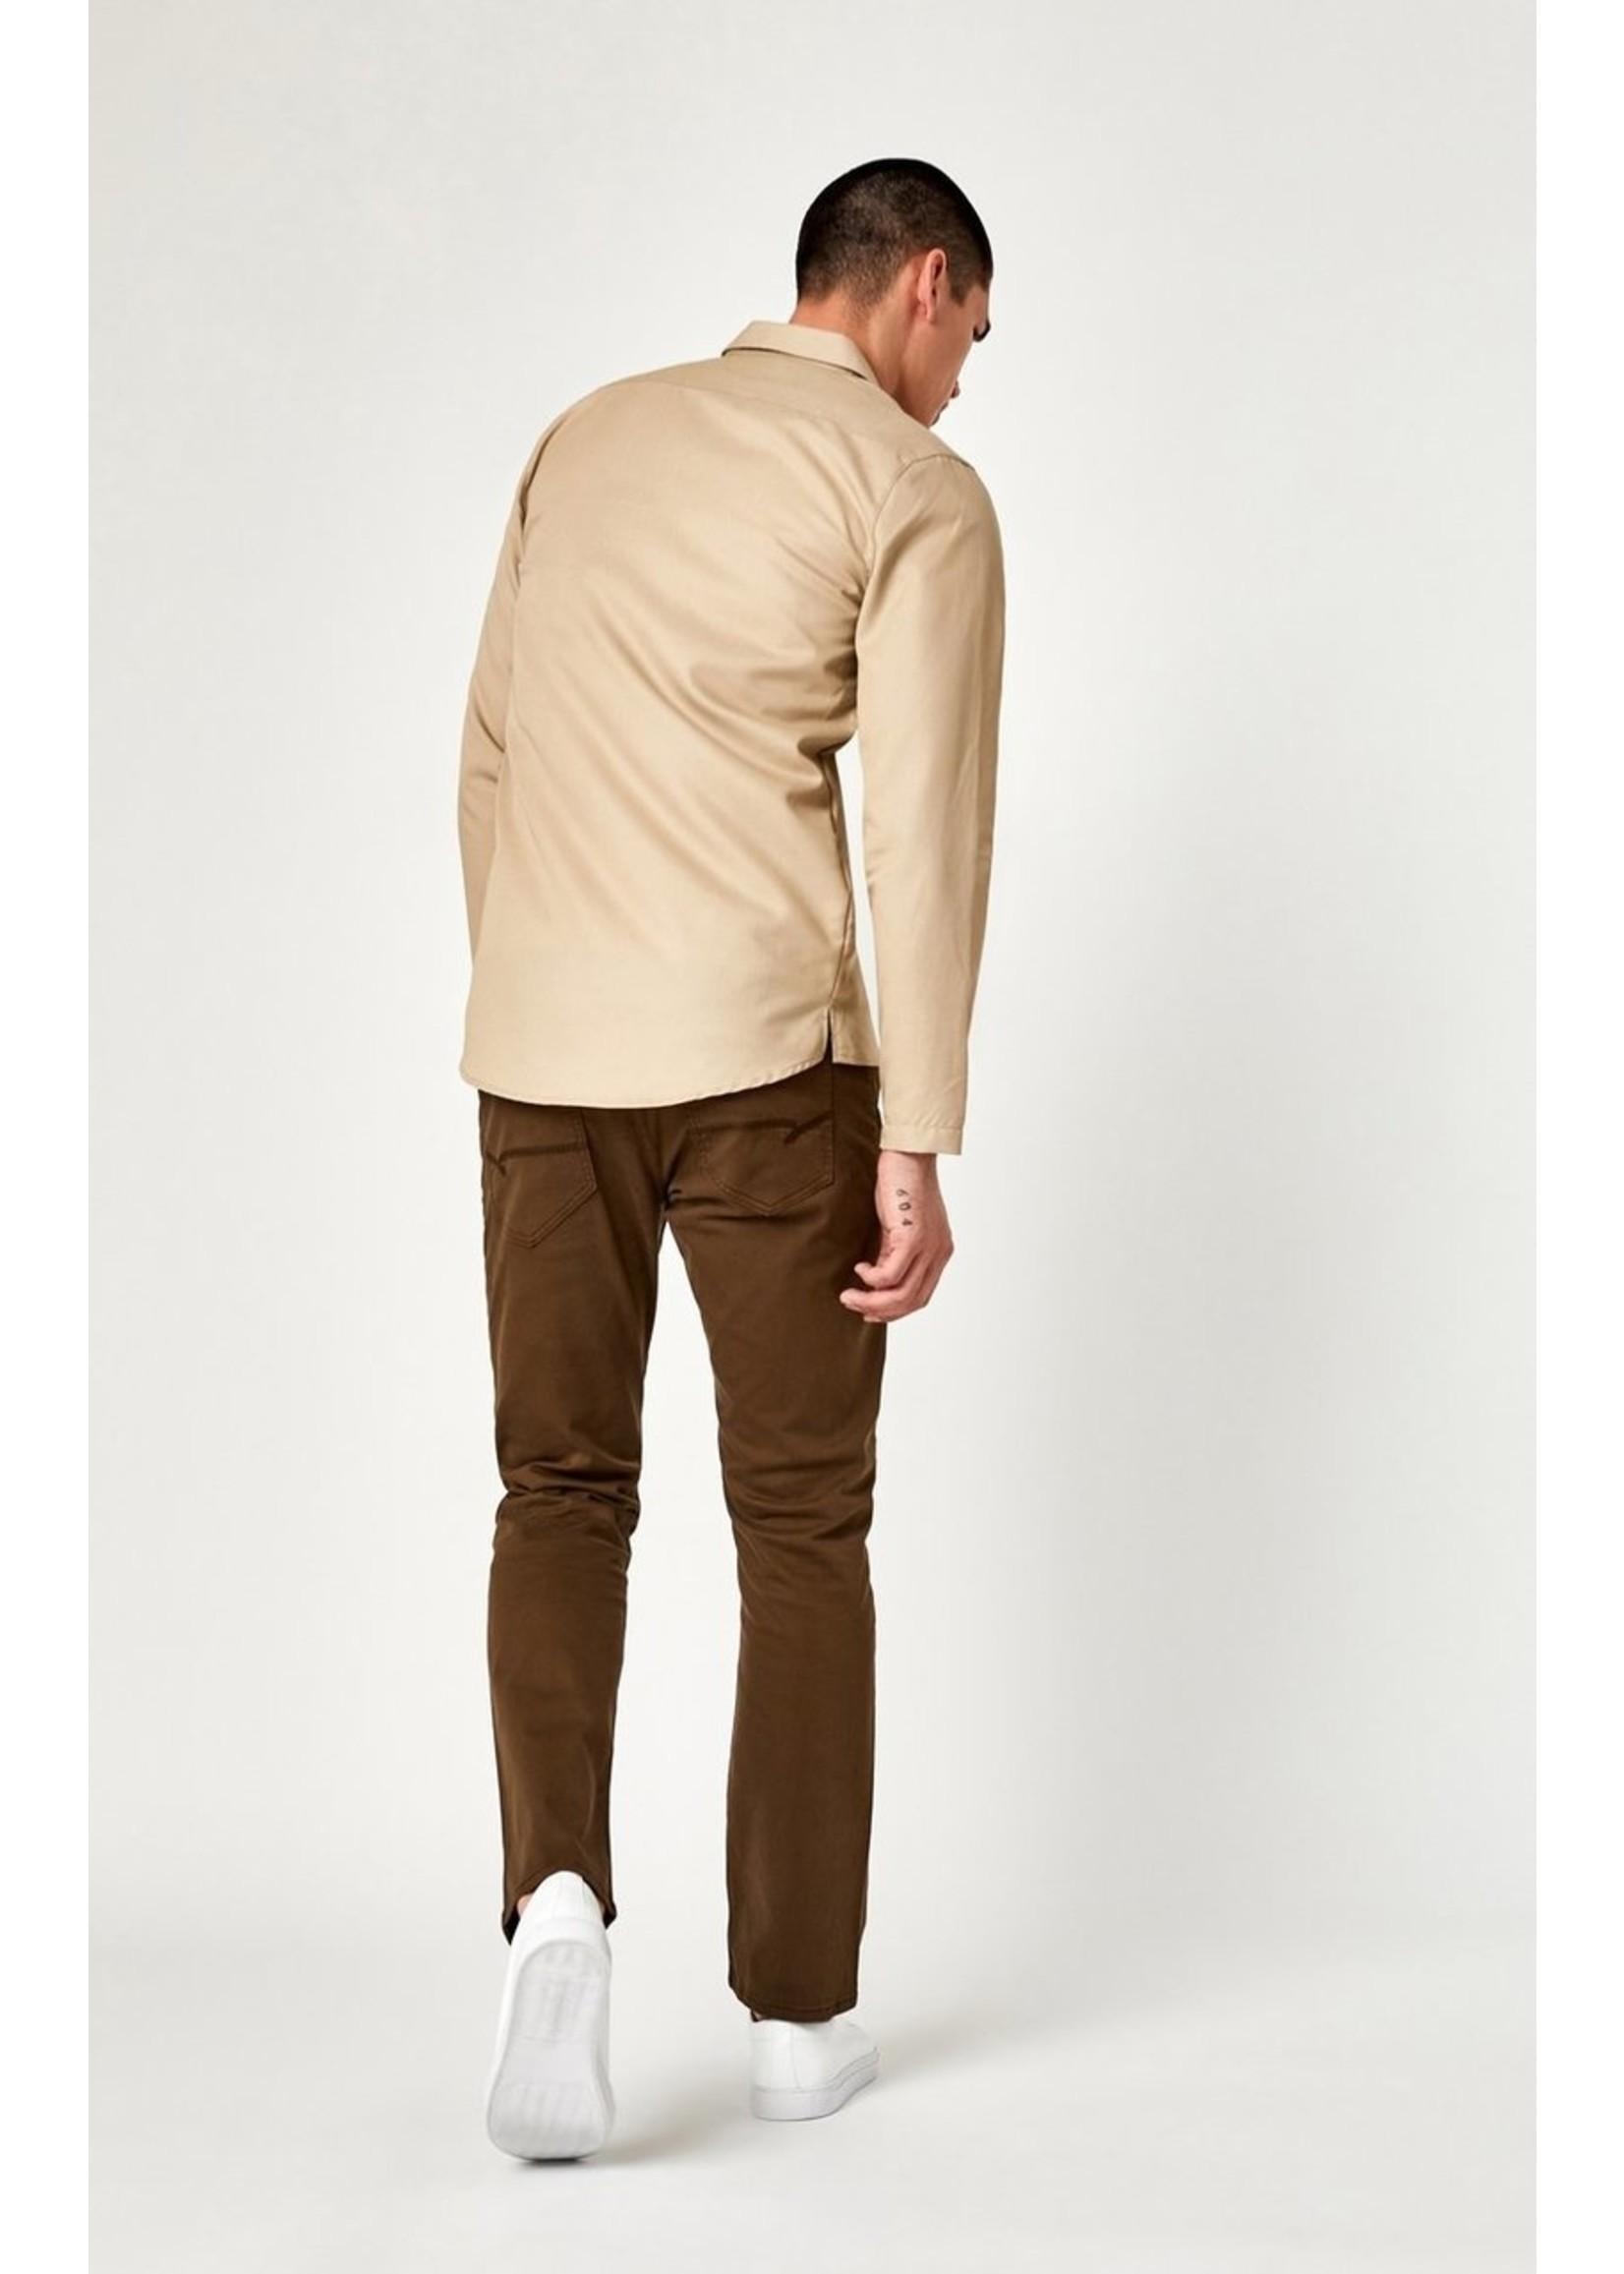 Mavi Jeans Marcus Brown Twill